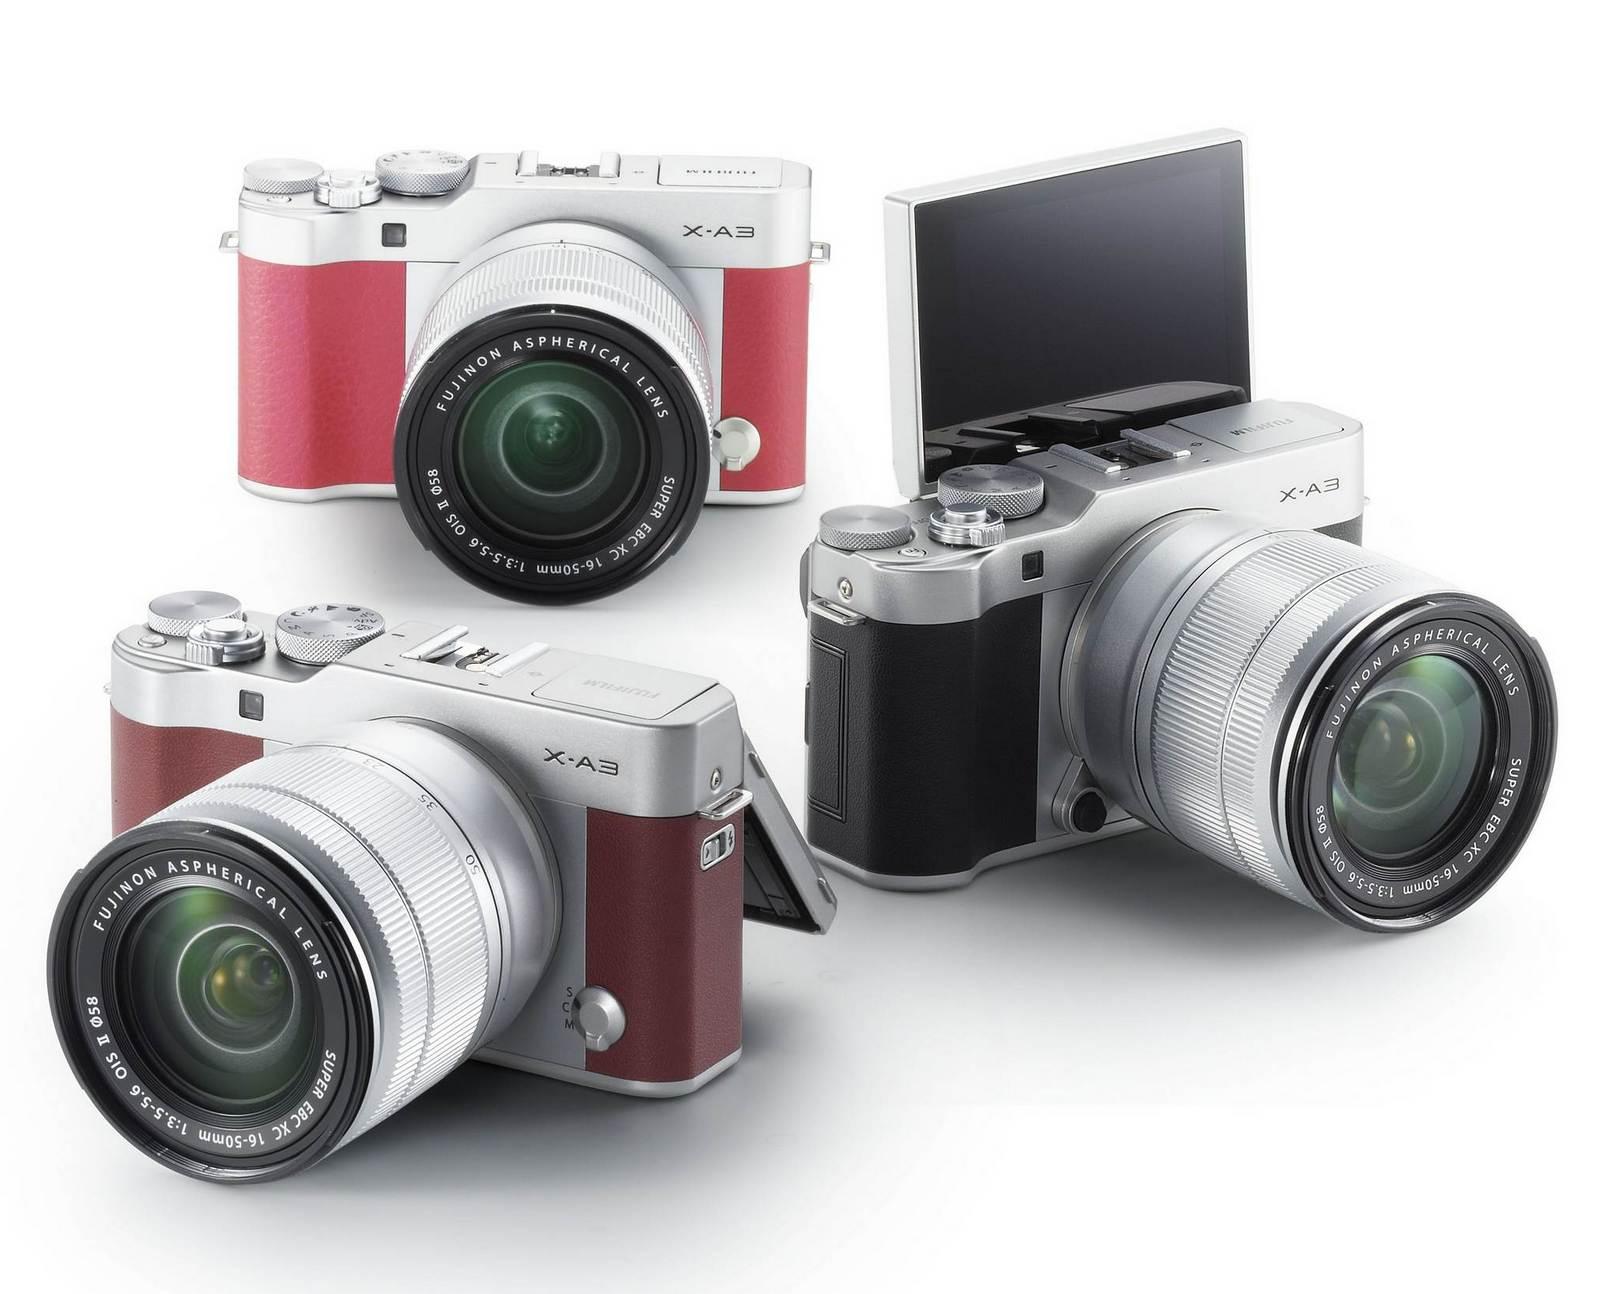 Fujifilm X-A3 - Cámara EVIL de 24 MP (Rosa, camel y negro)  con Objetivo XC 16-50 mm